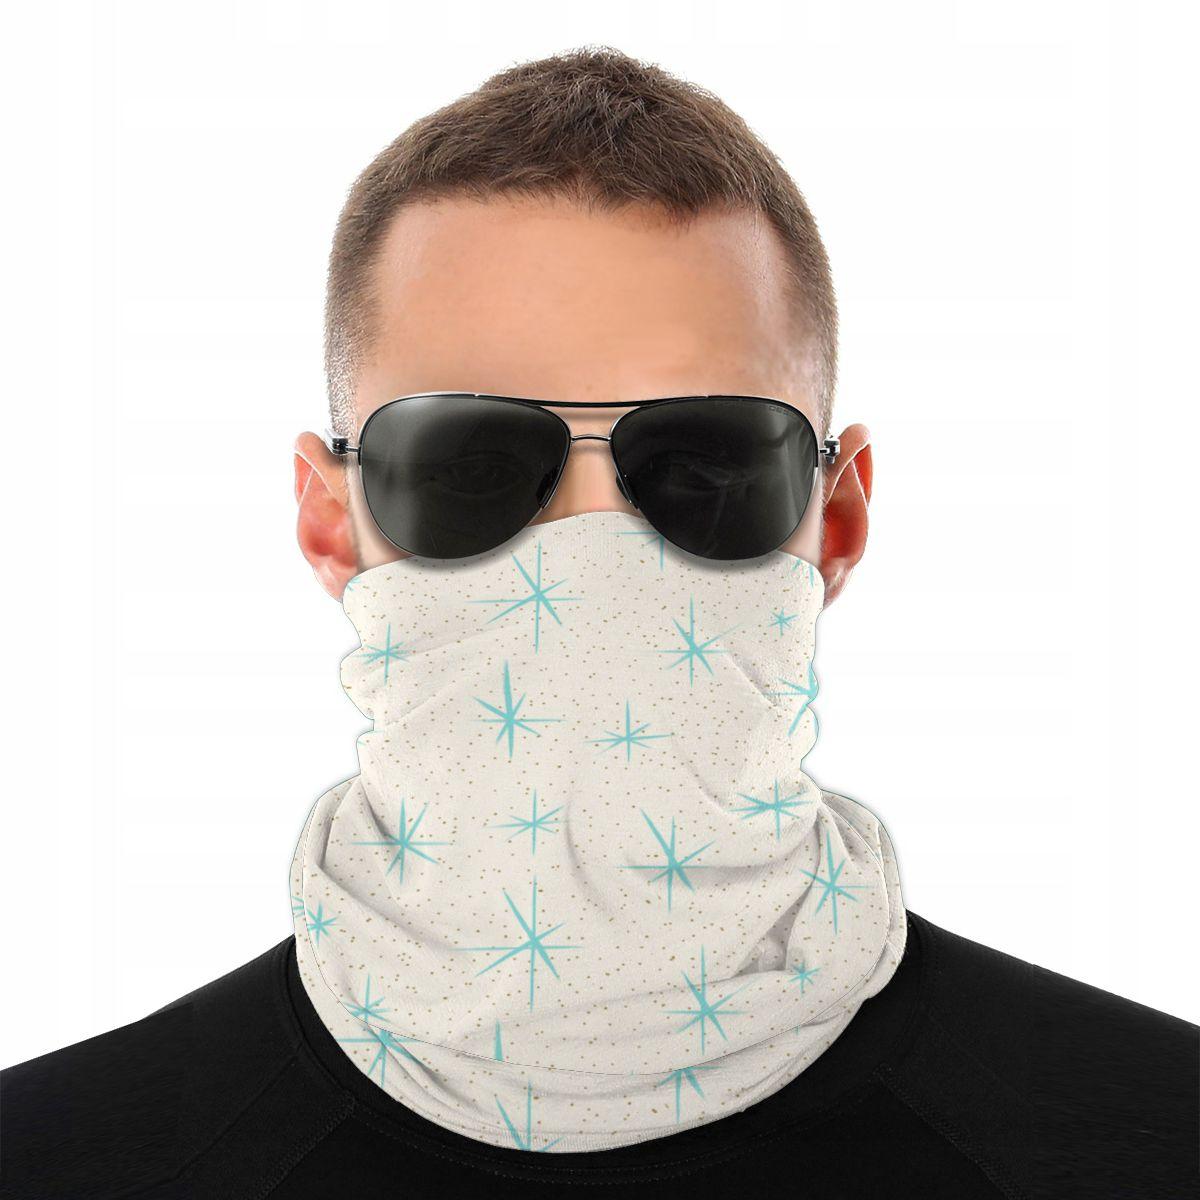 Space Age Turquoise Starburst Scarf Neck Face Mask Men Women Fashion Neck Warmer Neck Bandanas Windproof Headband Biking Hiking